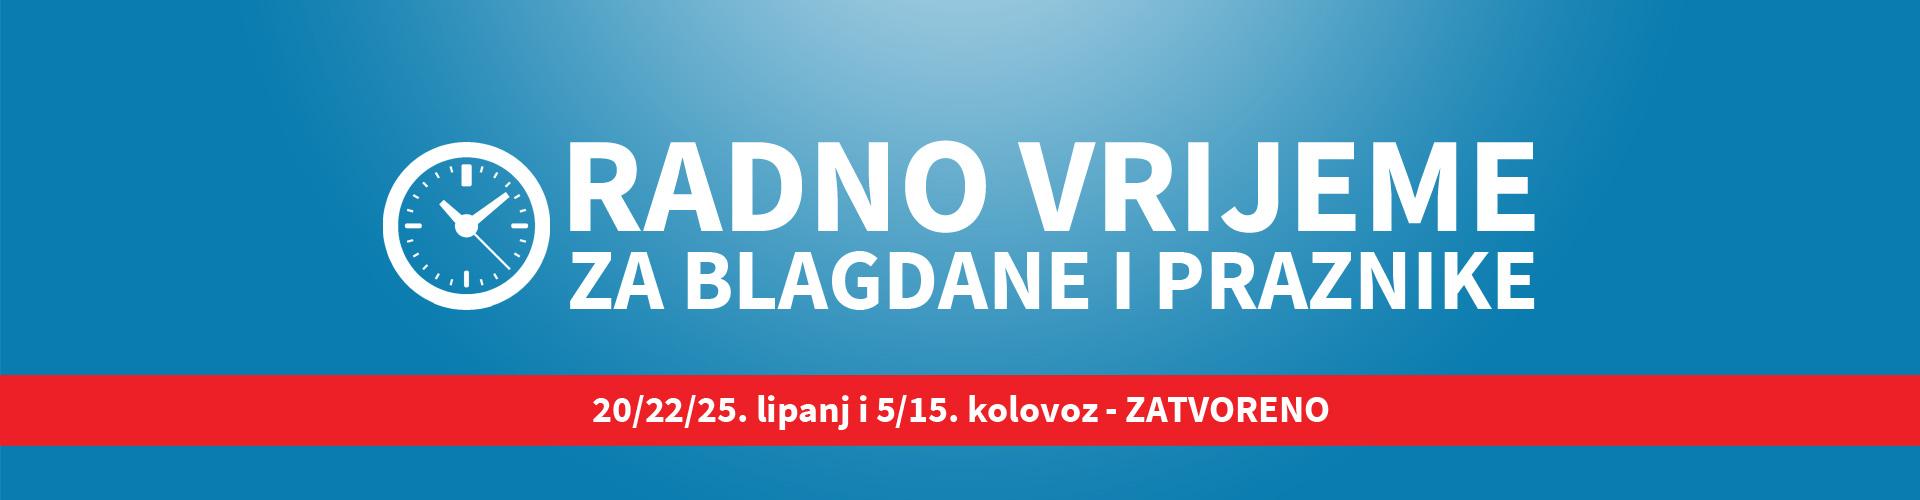 https://www.kimicommerce.hr/Repository/Banners/radno-vrijeme-blagdani-praznici-062019-02.jpg